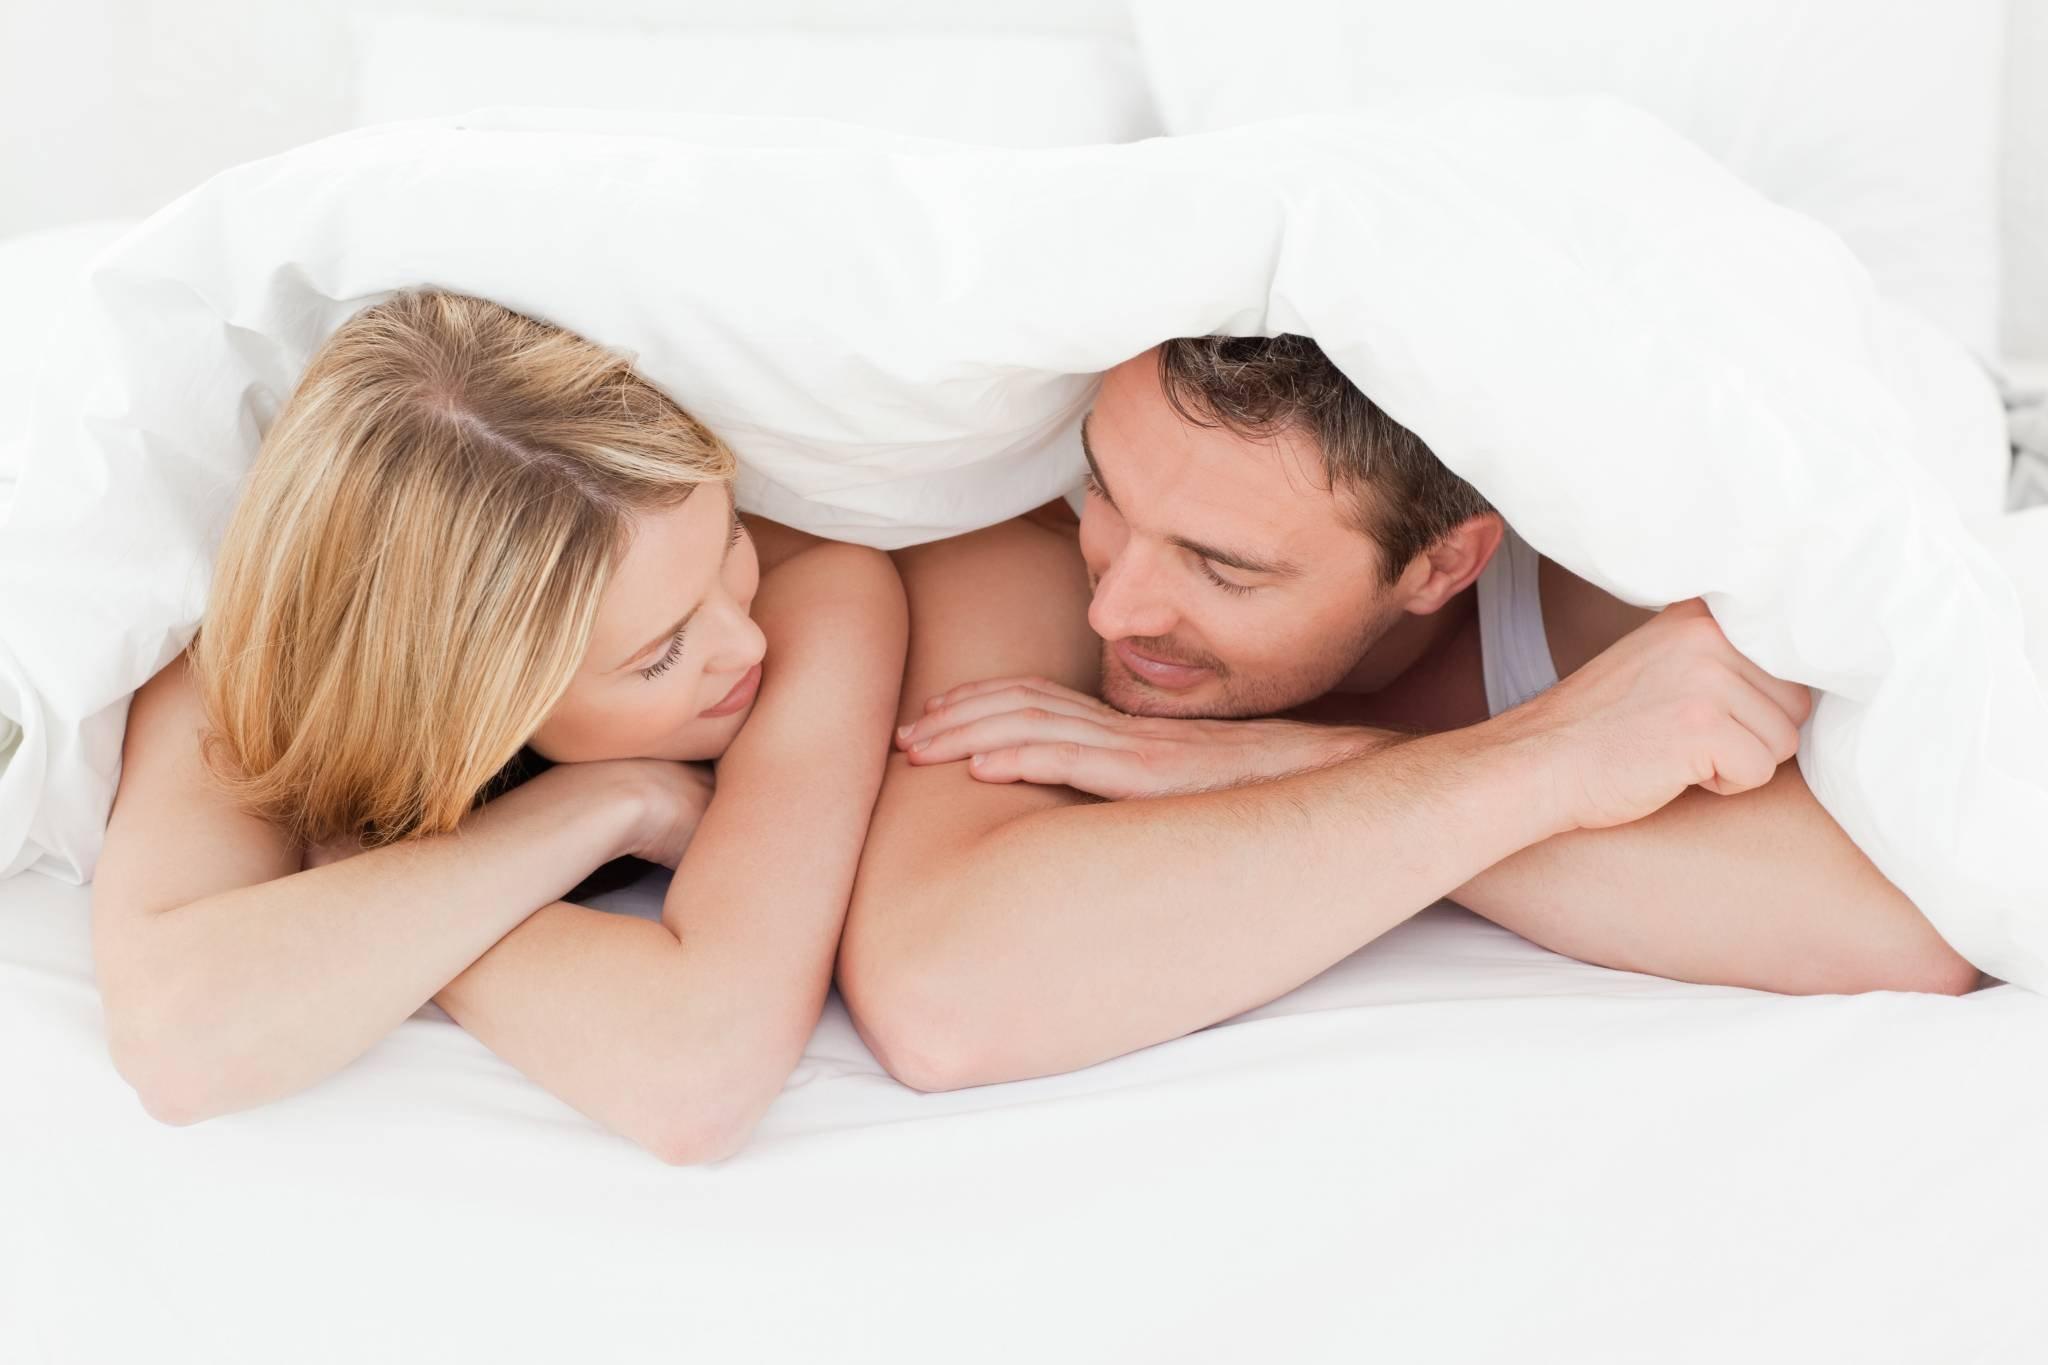 Секс на санотория 12 фотография